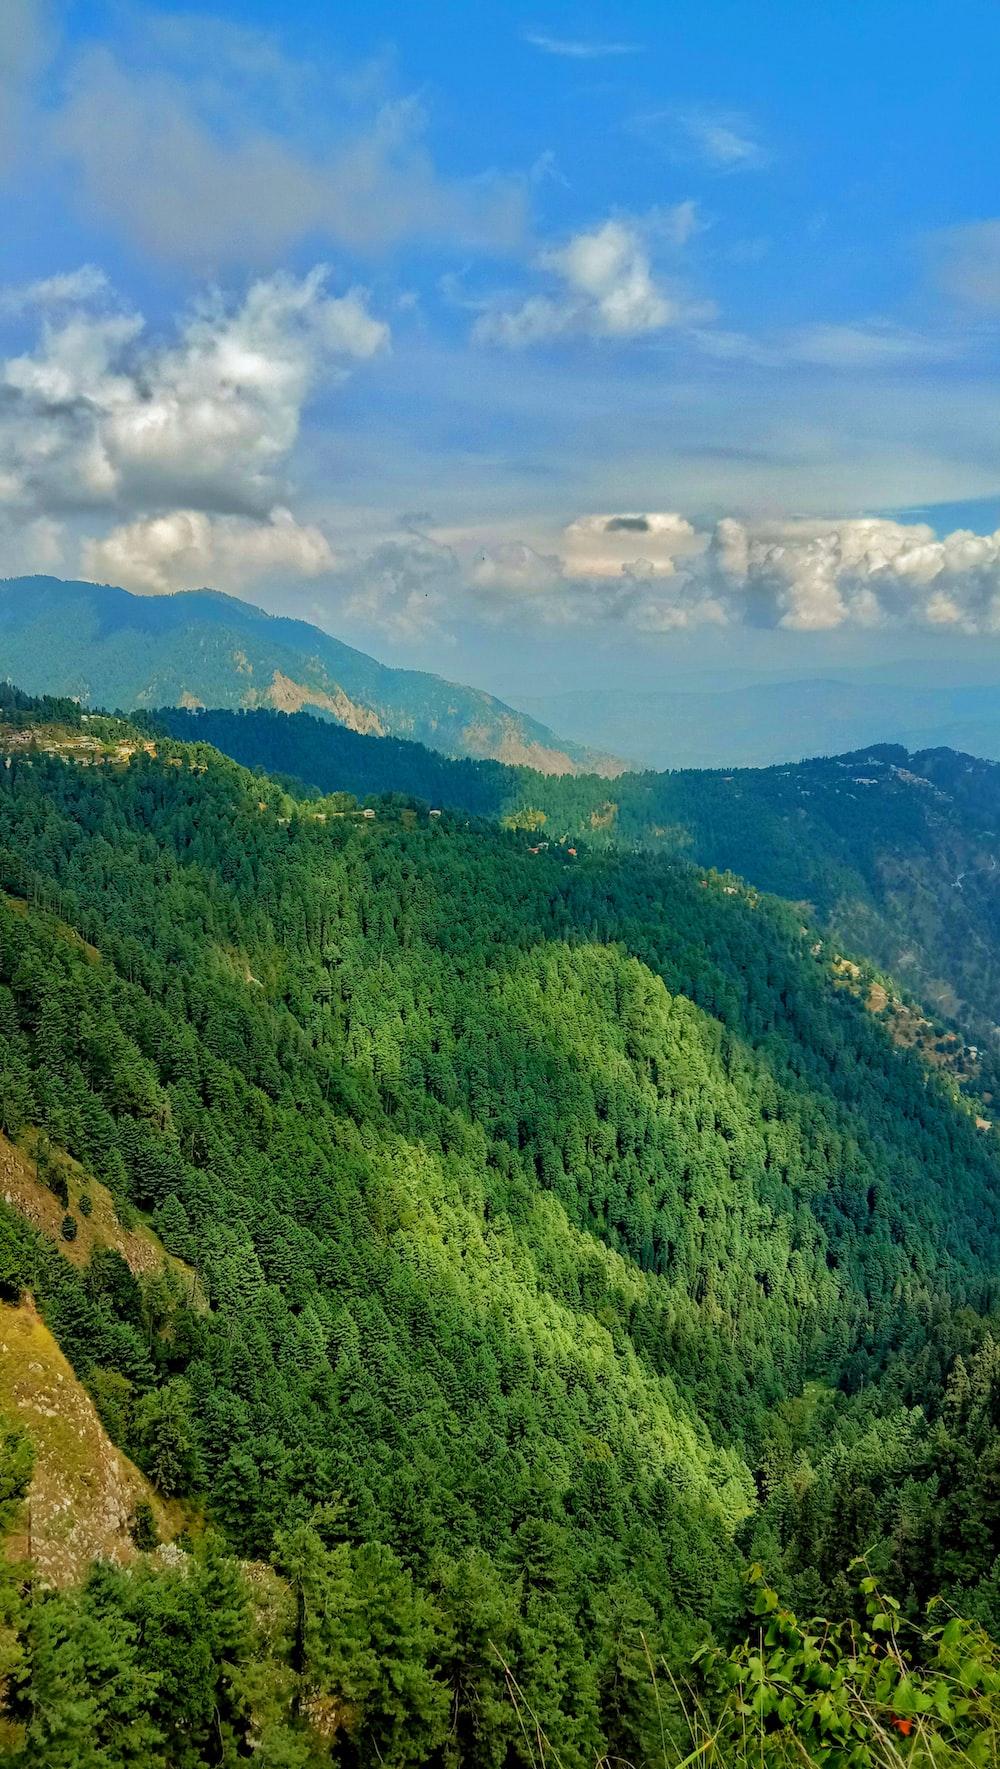 tall trees on hills